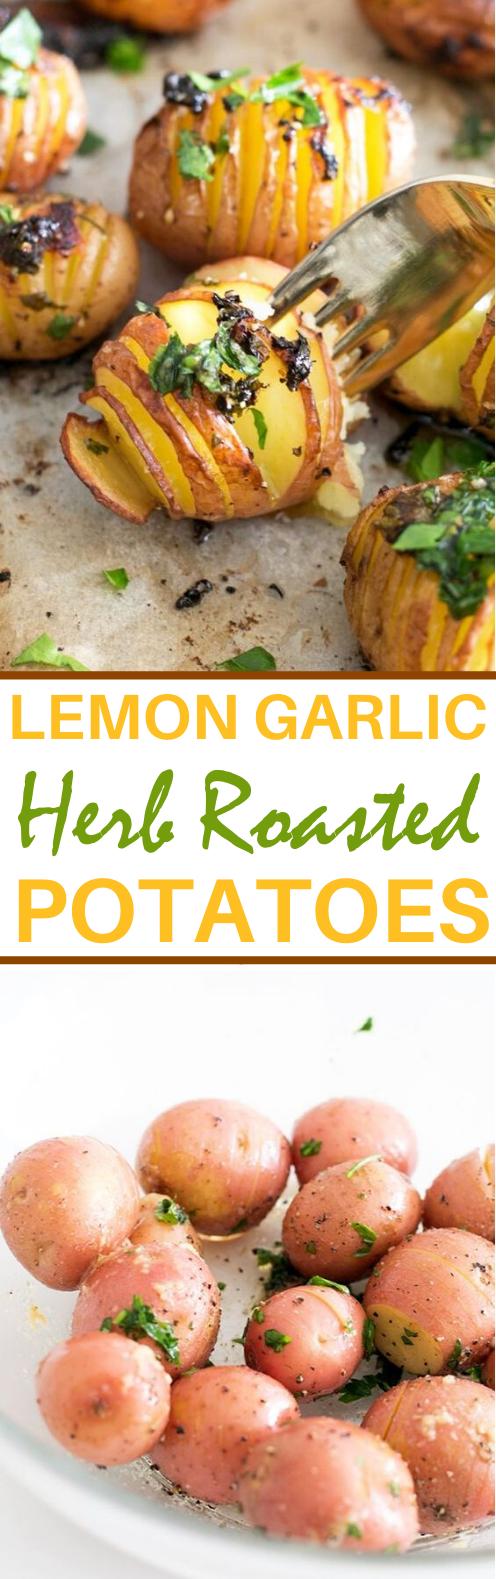 Vegan Lemon Garlic Herb Roasted Potatoes #vegan #dinner #sidedish #potatoes #glutenfree